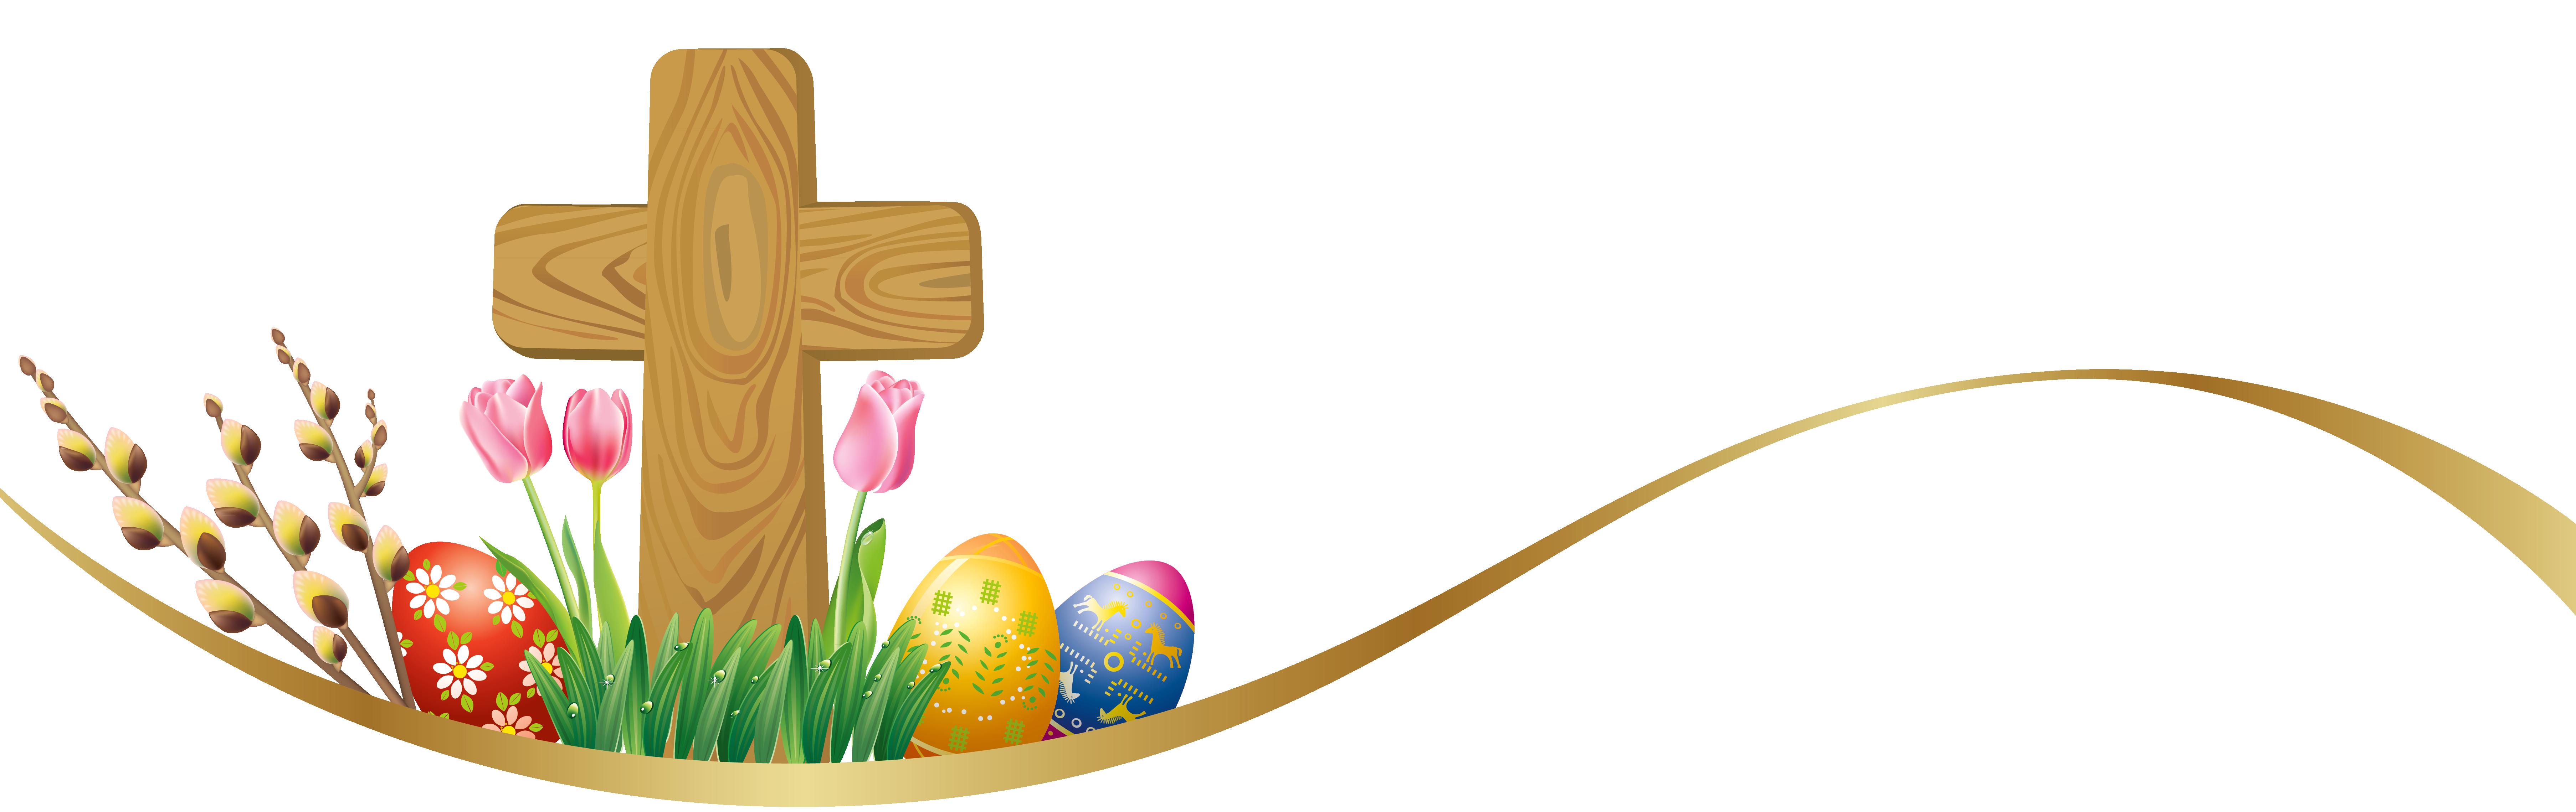 7226x2279 Easter Cross Borders Happy Easter 2017